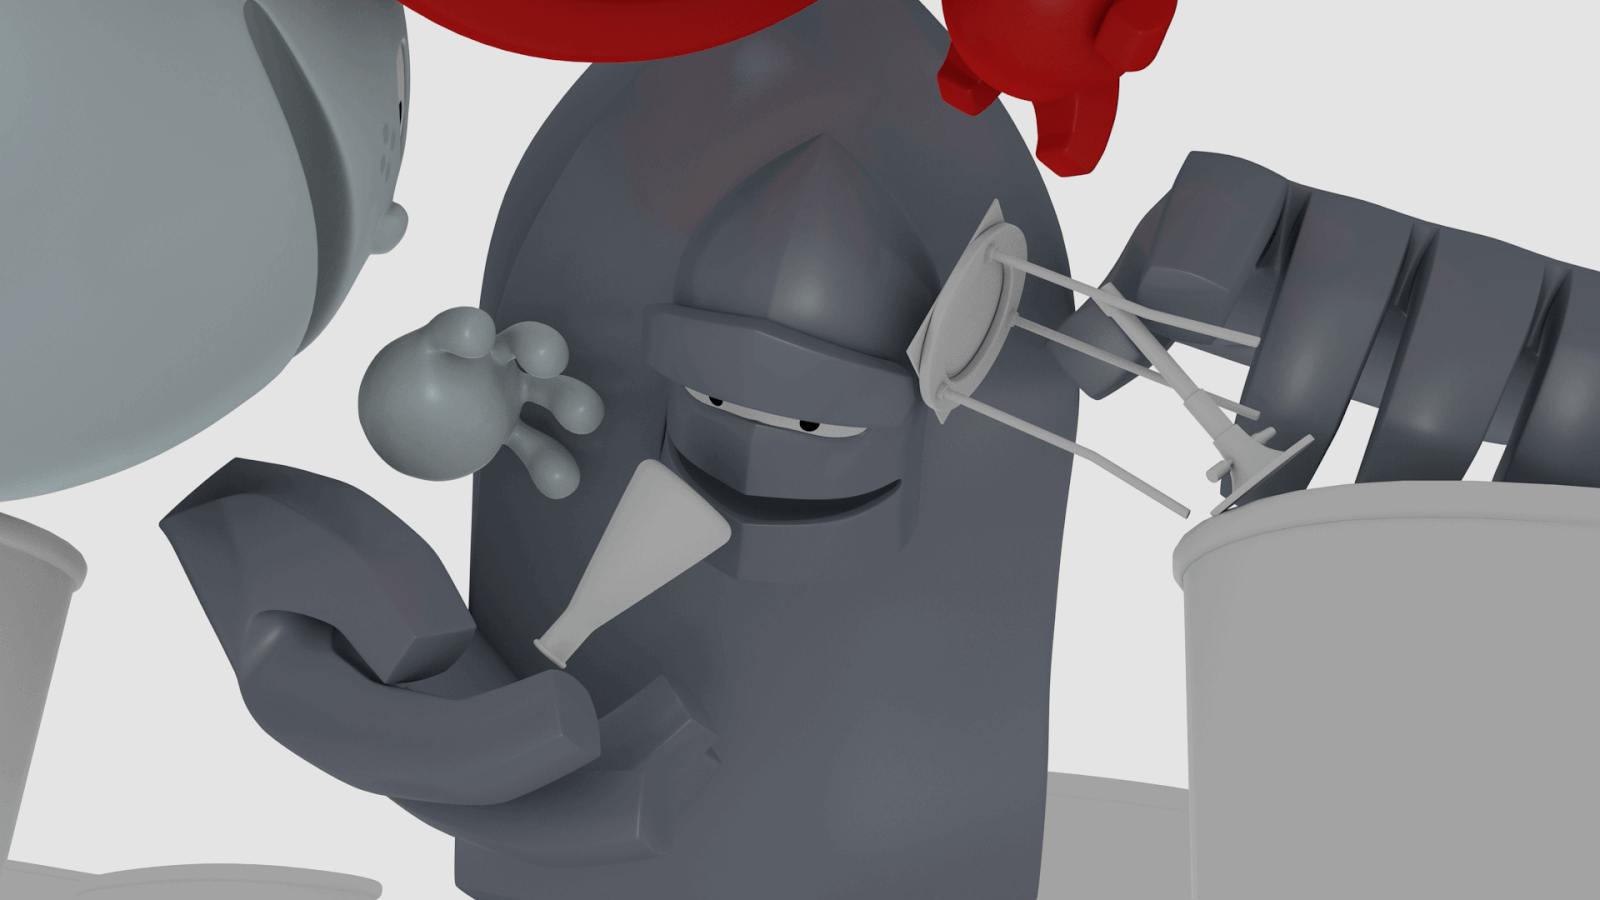 Iron Catch Animation